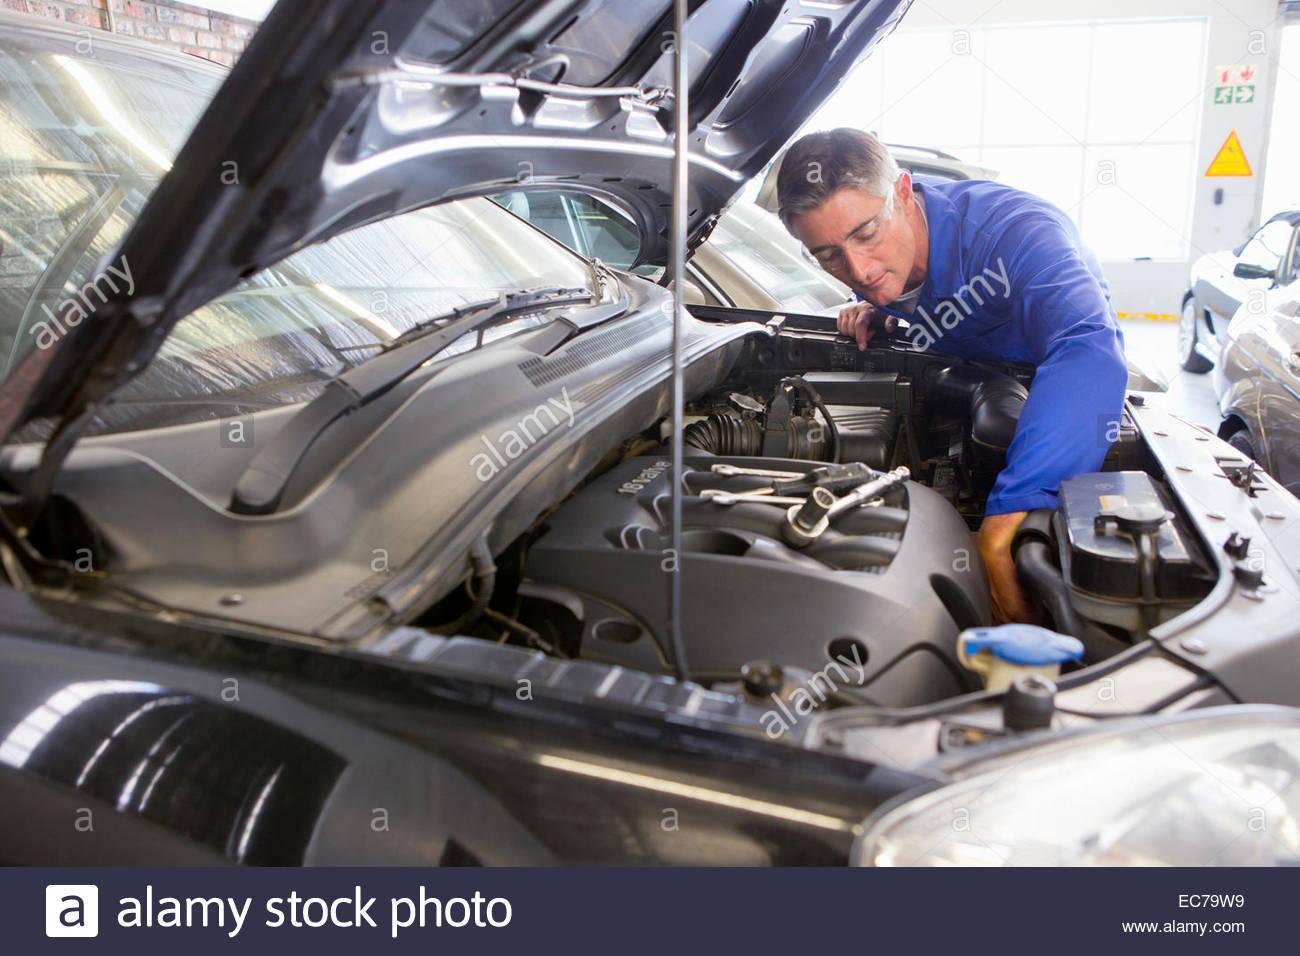 Mechanic Working On Car Stockfotos & Mechanic Working On Car Bilder ...